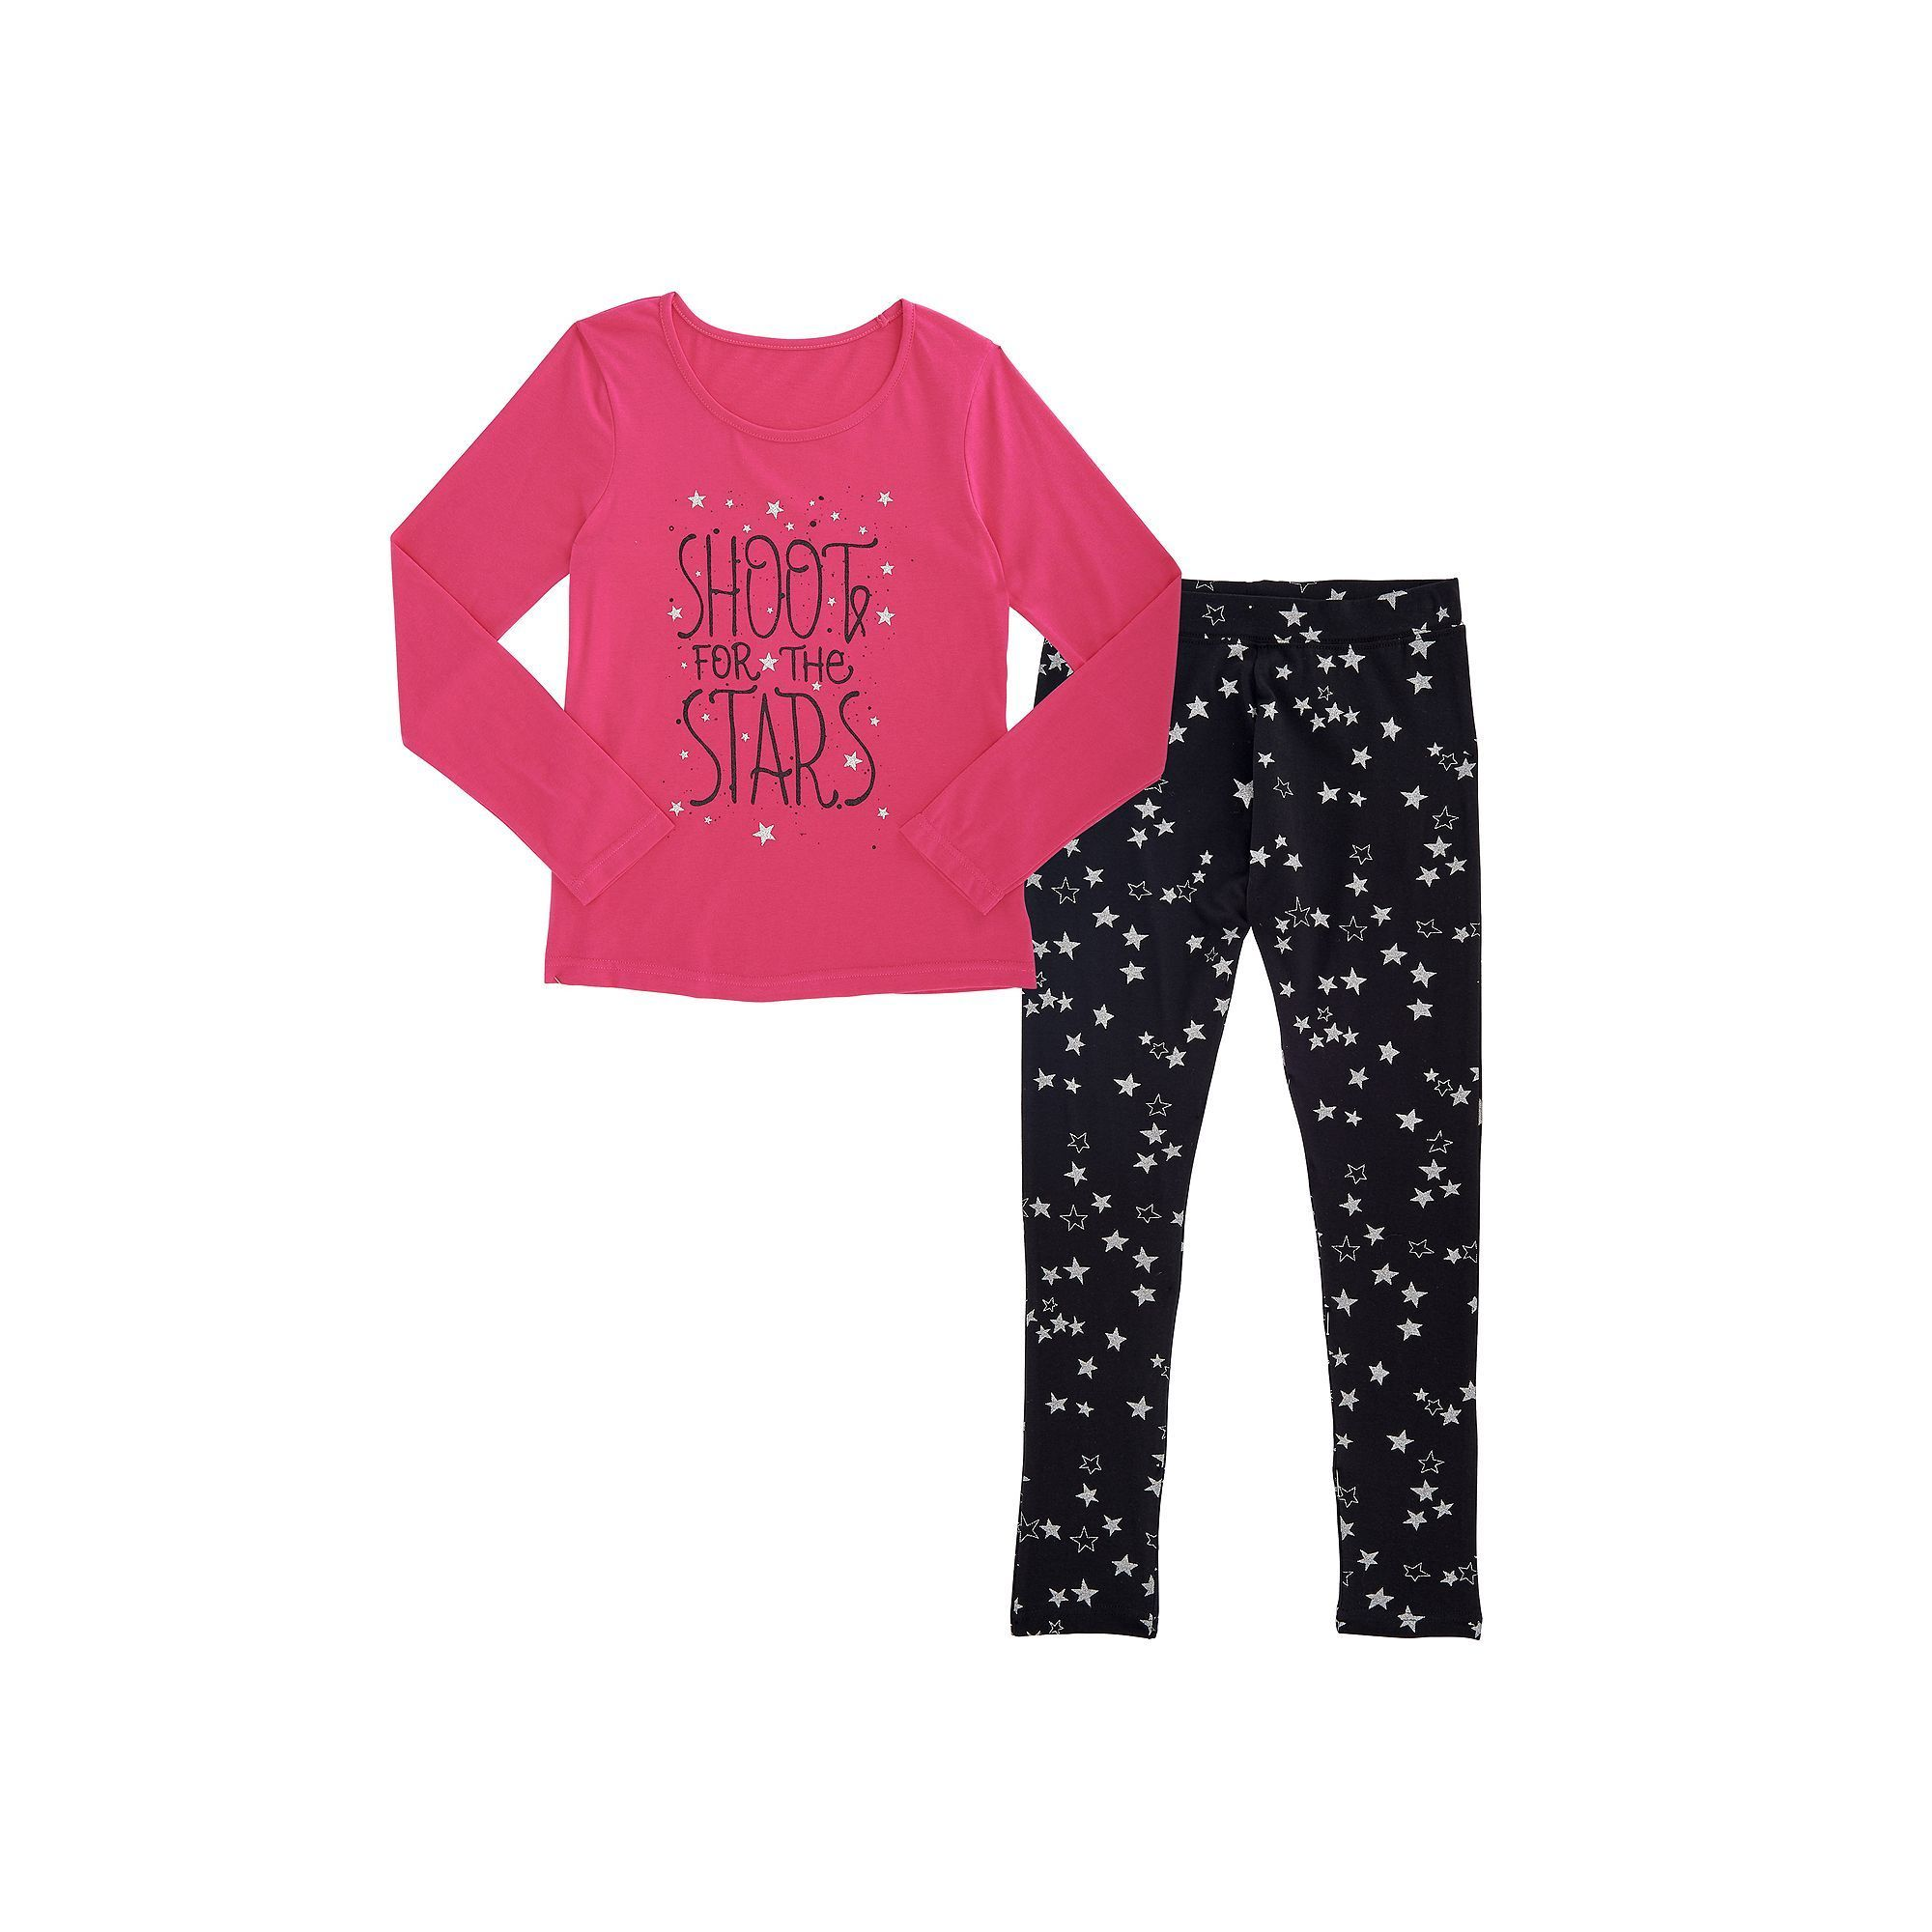 Girls Plus Size French Toast Long Sleeve Graphic Tee & Coordinating Leggings Set, Girl's, Size: 14-16 Plus, Brt Purple